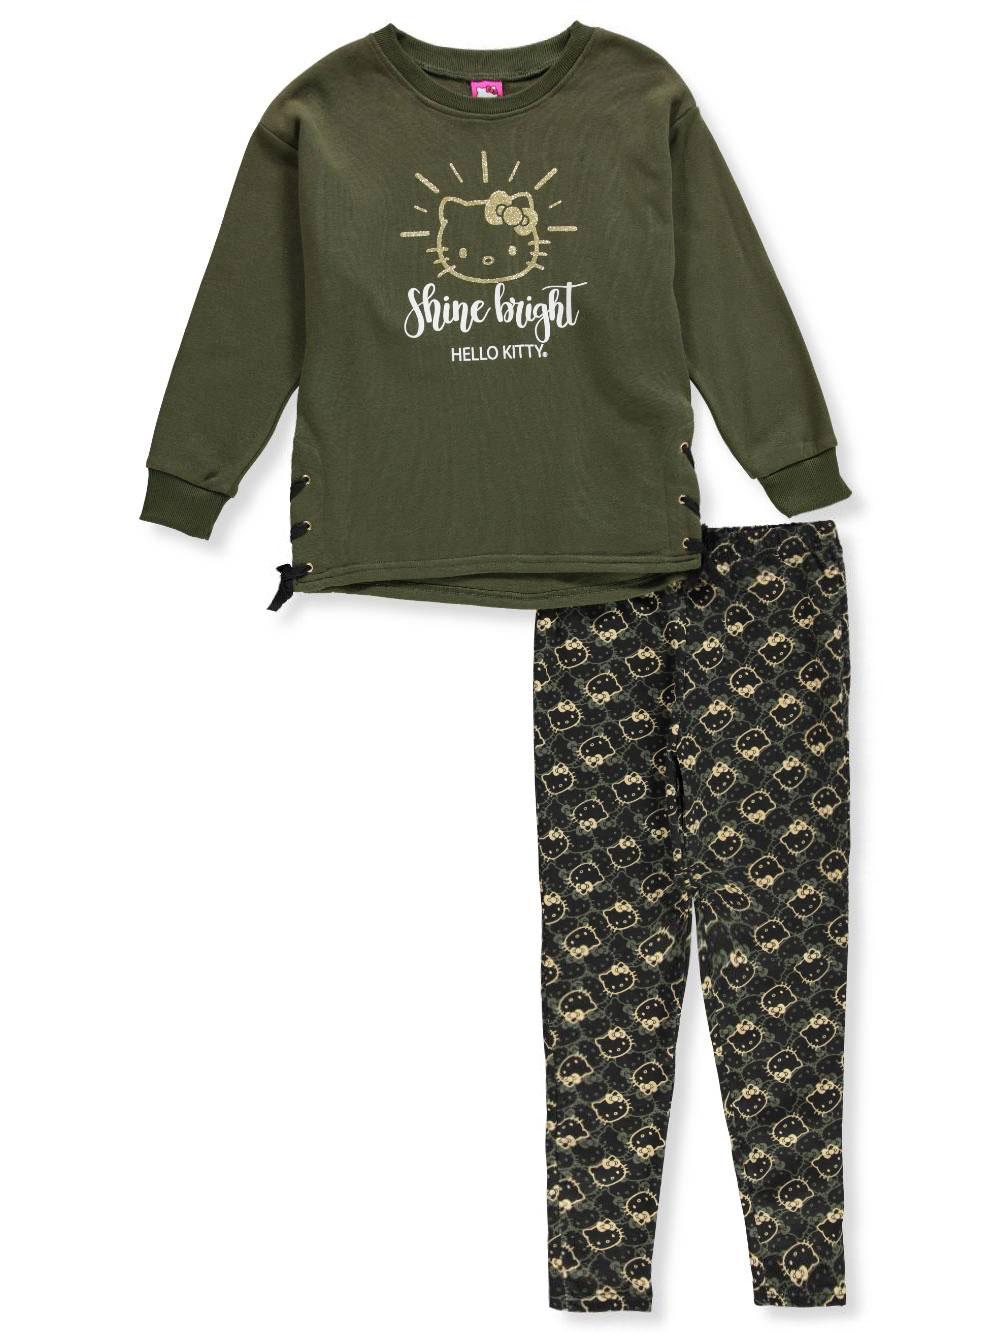 d01dbb231 Hello Kitty Girls' 2-Piece Leggings Set Outfit